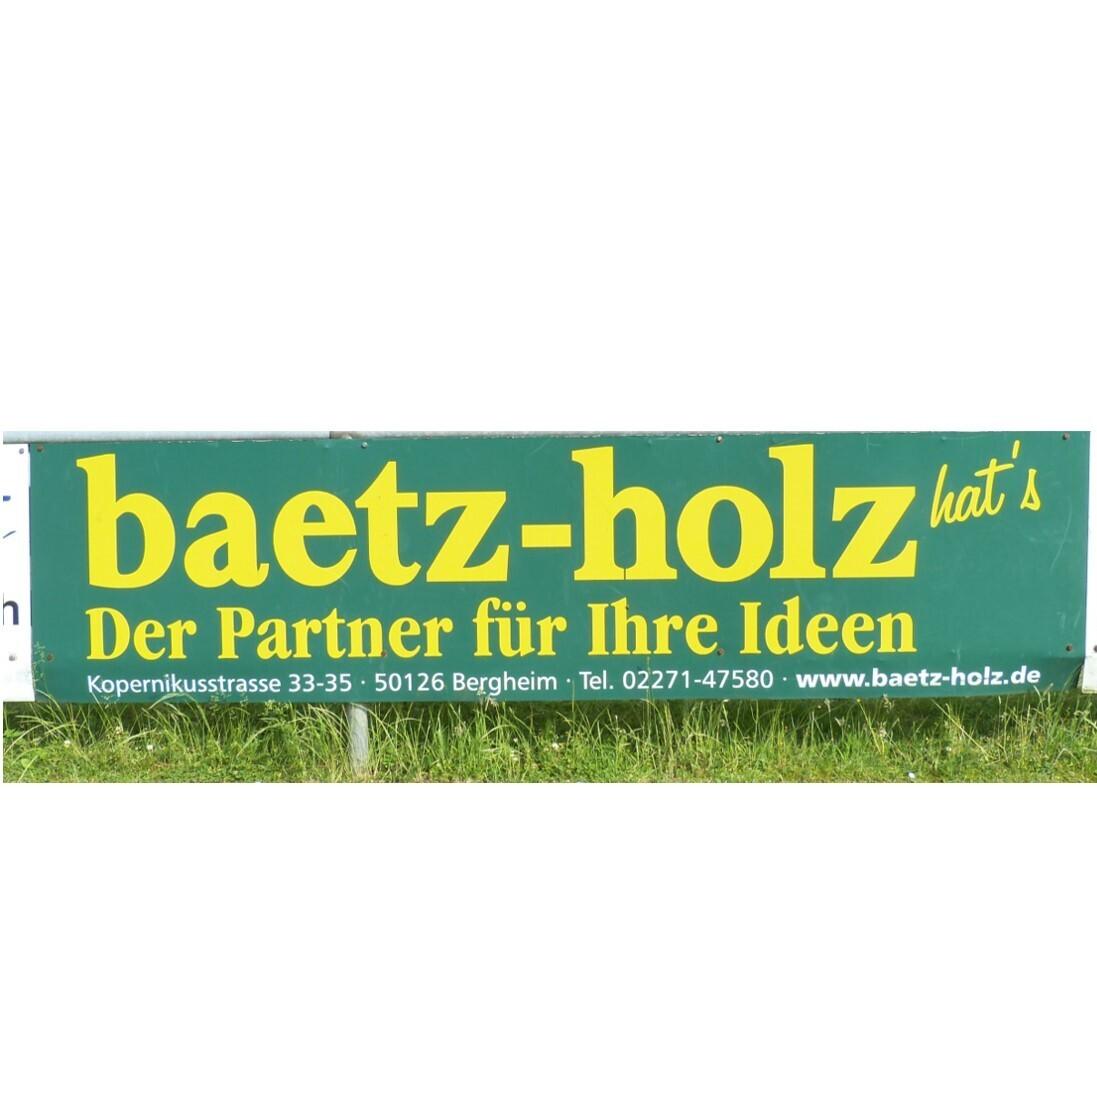 Baetz